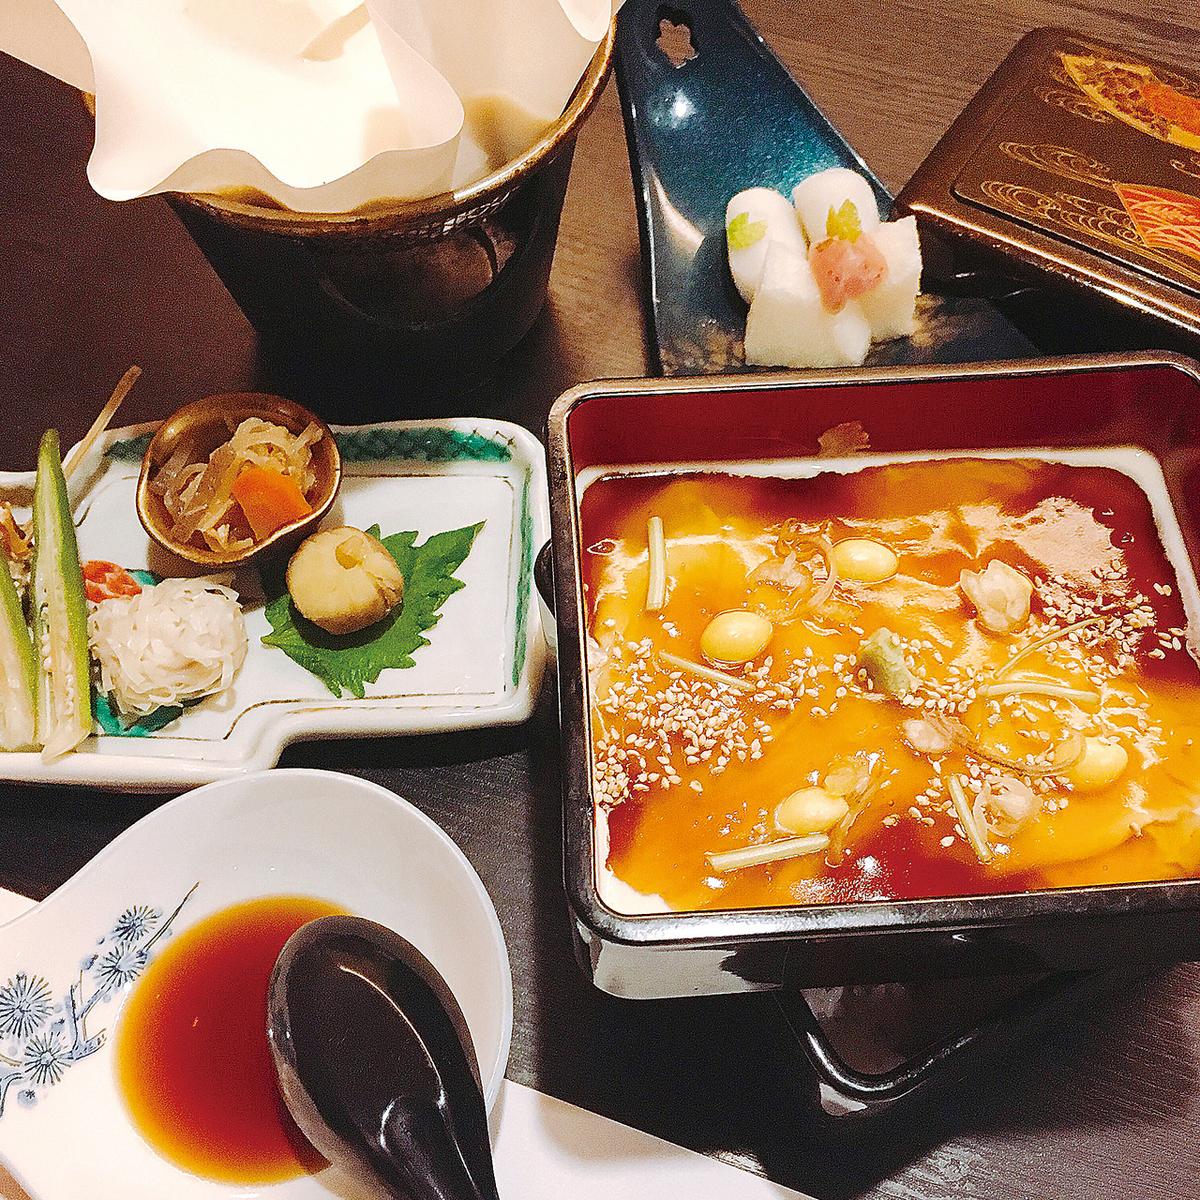 Nanakori Yuba Ogre serving box lunch